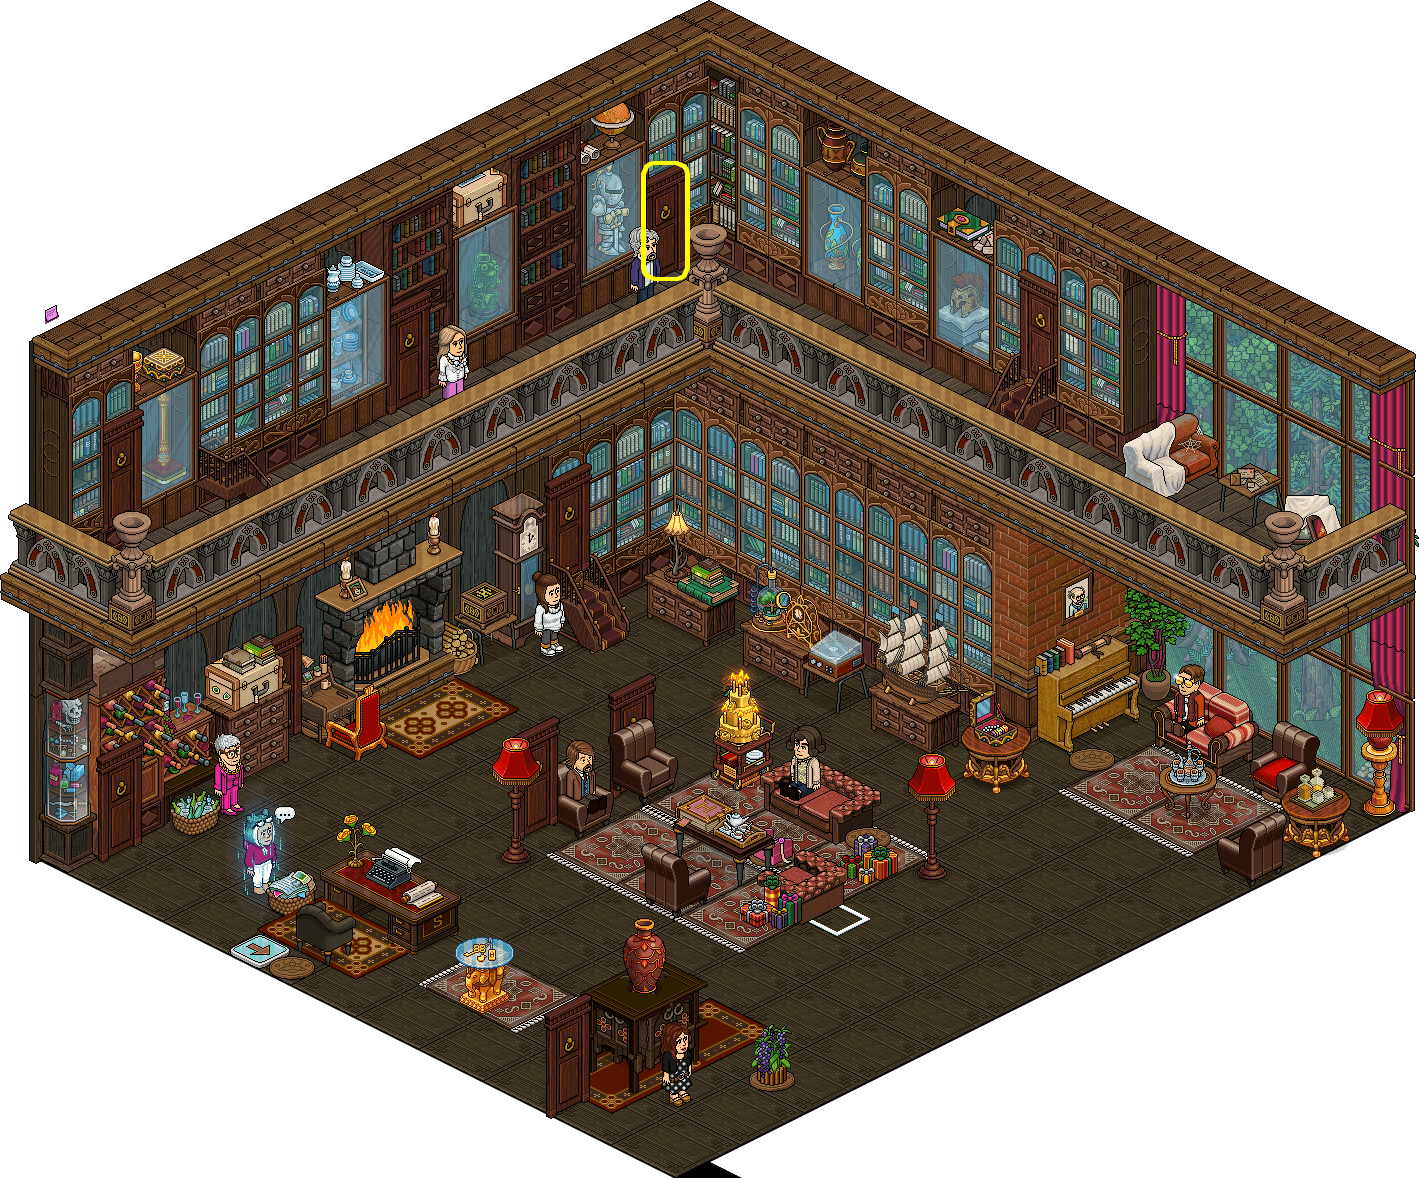 [K.O] - Tutoriel0 - Salon principal - les suspects